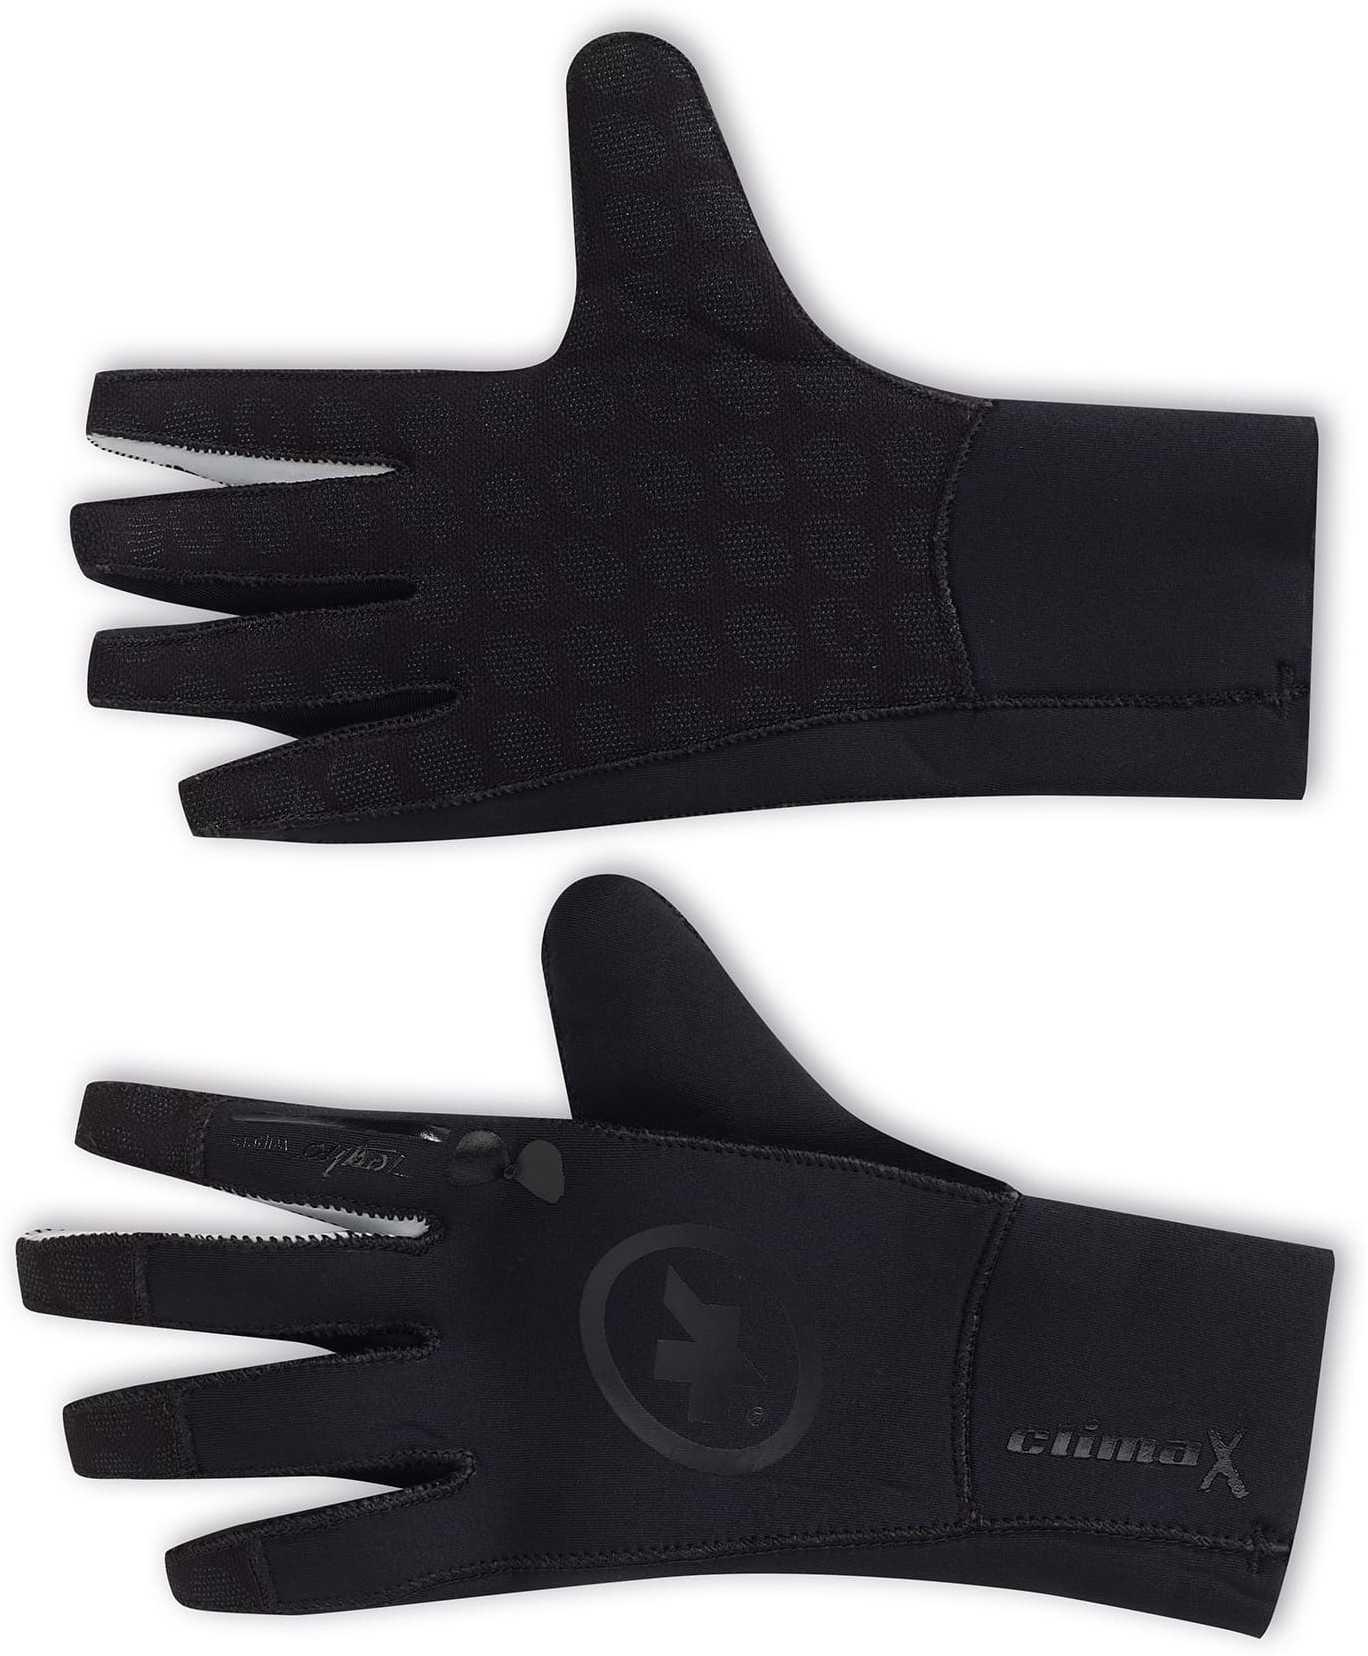 Assos Cykelhandske rainGlove_evo7 | Handsker